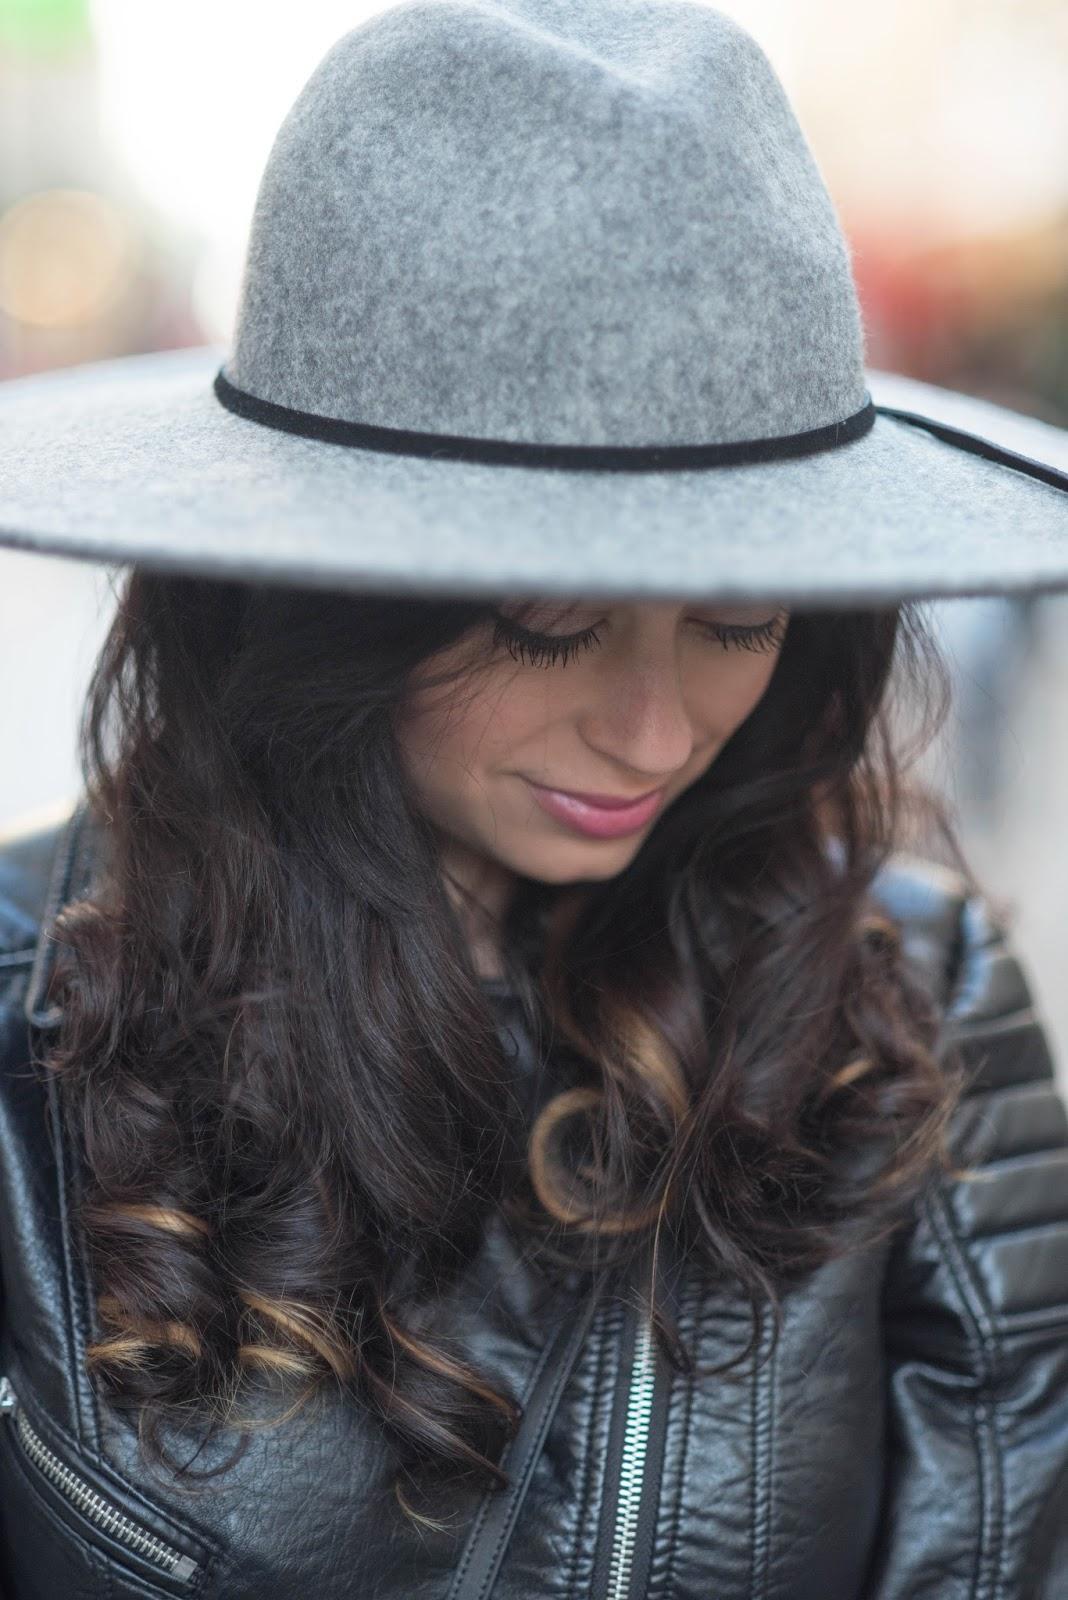 coco and vera, top paris fashion blog, portrait, cee fardoe, free people hat, christian dior lipstick, ombre hair, curls